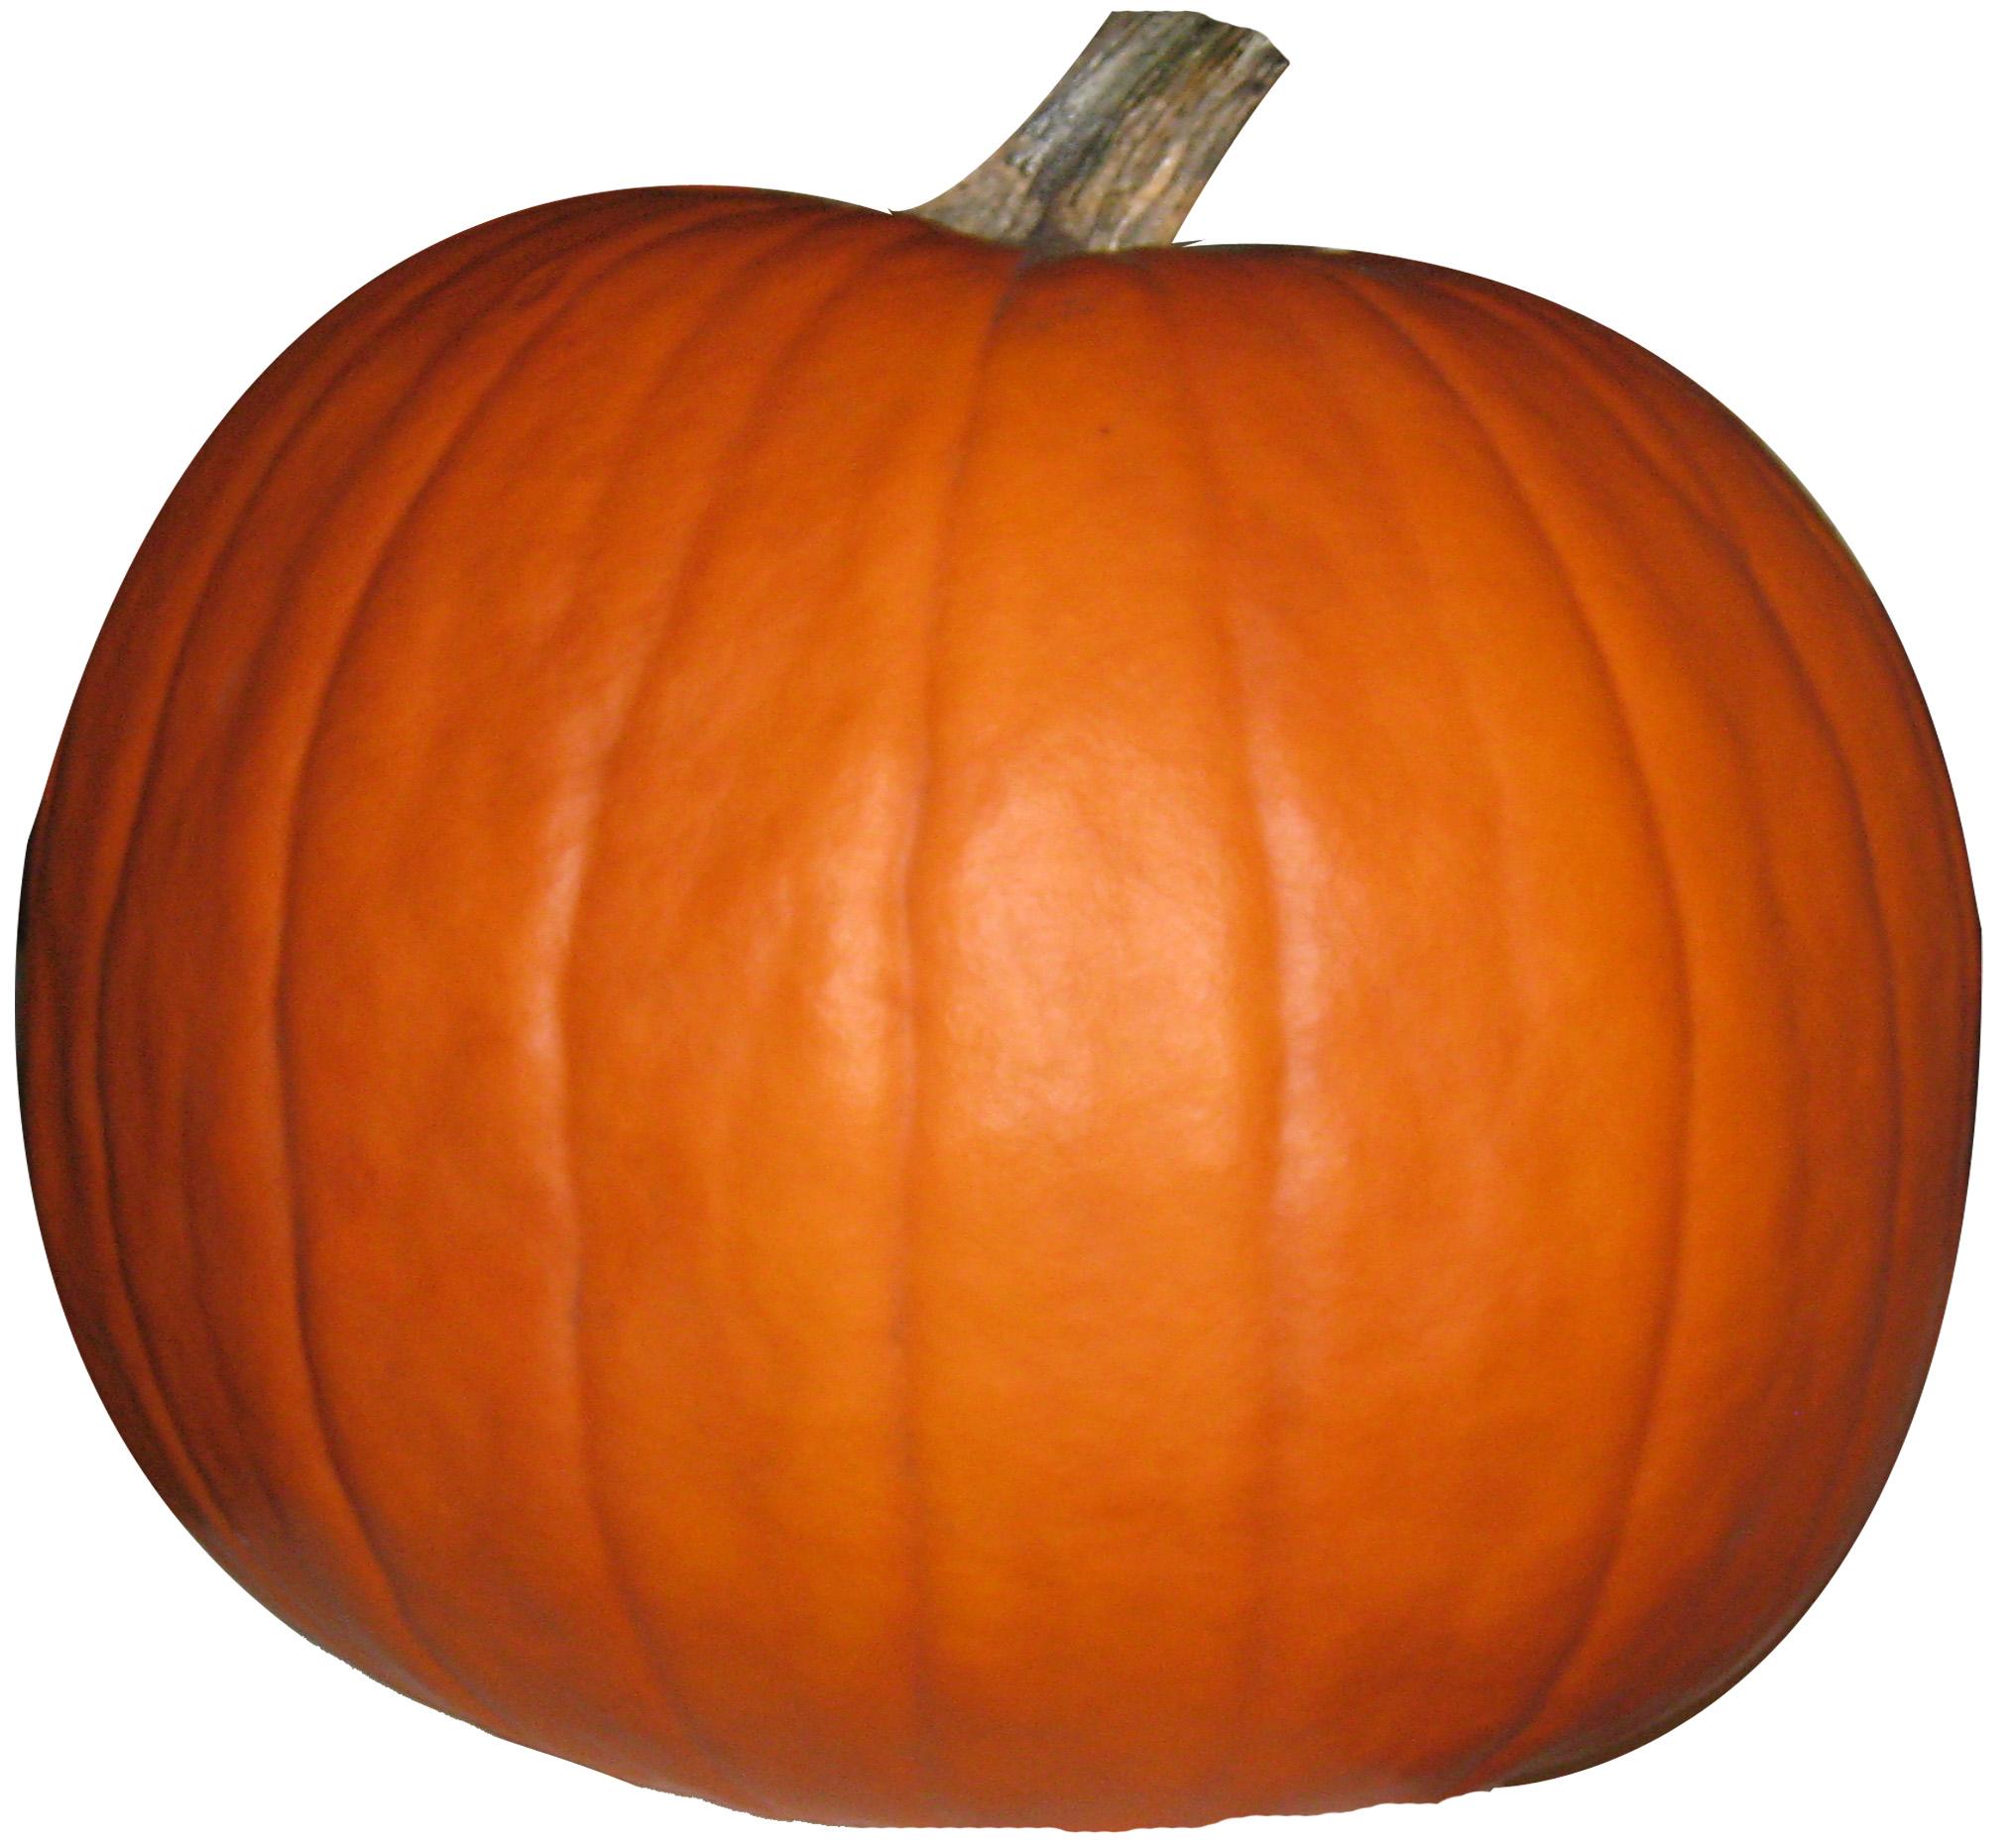 Make Your Own Pumpkin RPC